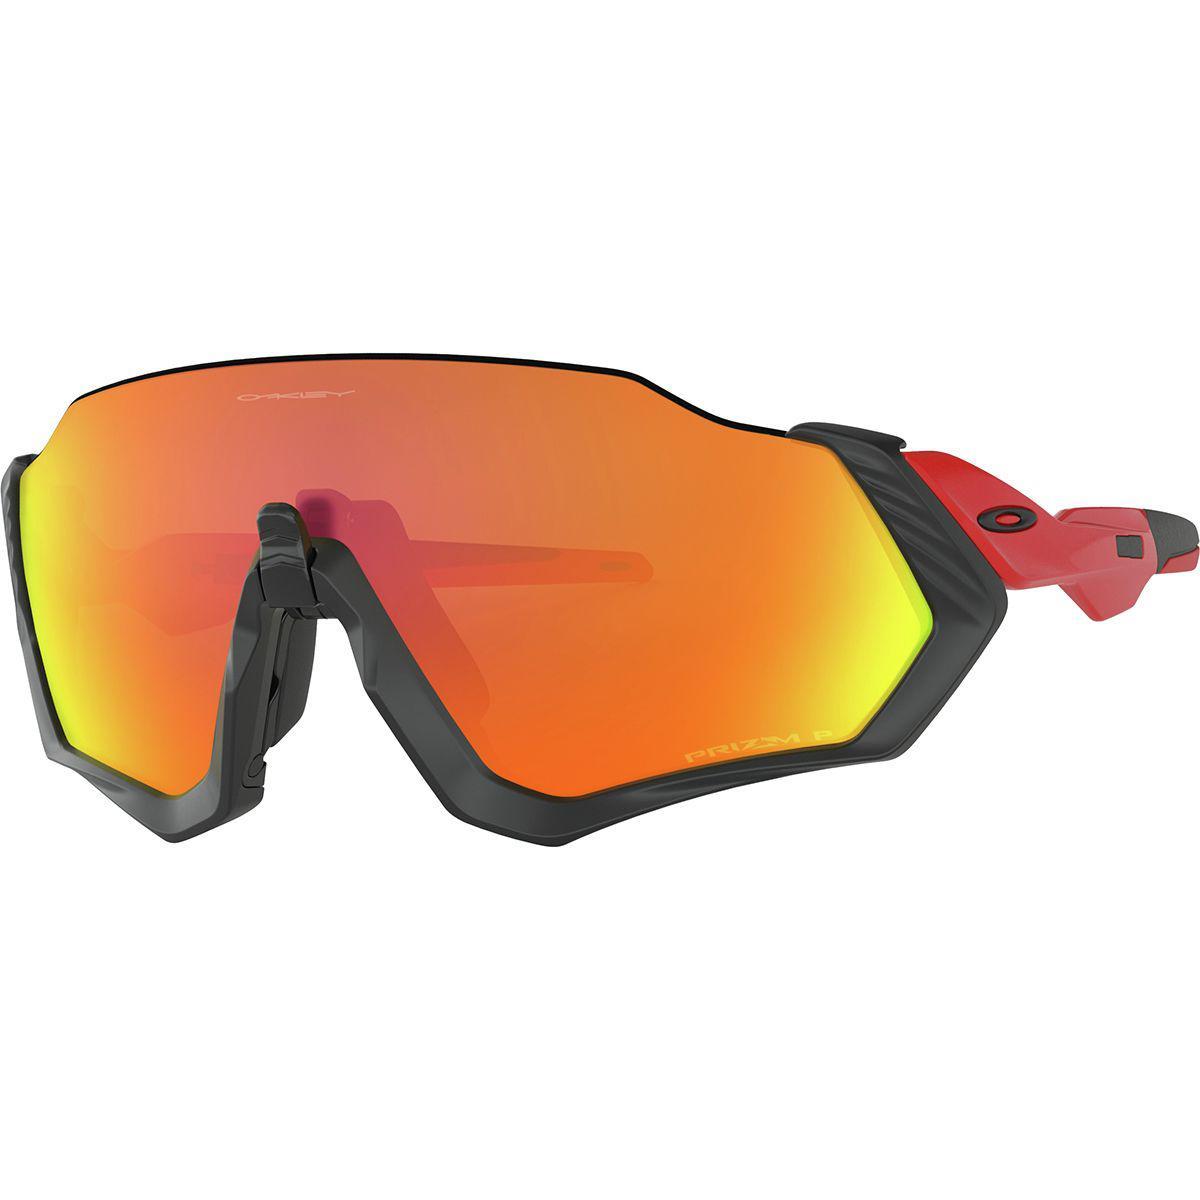 b00a013bba Lyst - Oakley Flight Jacket Prizm Polarized Sunglasses for Men